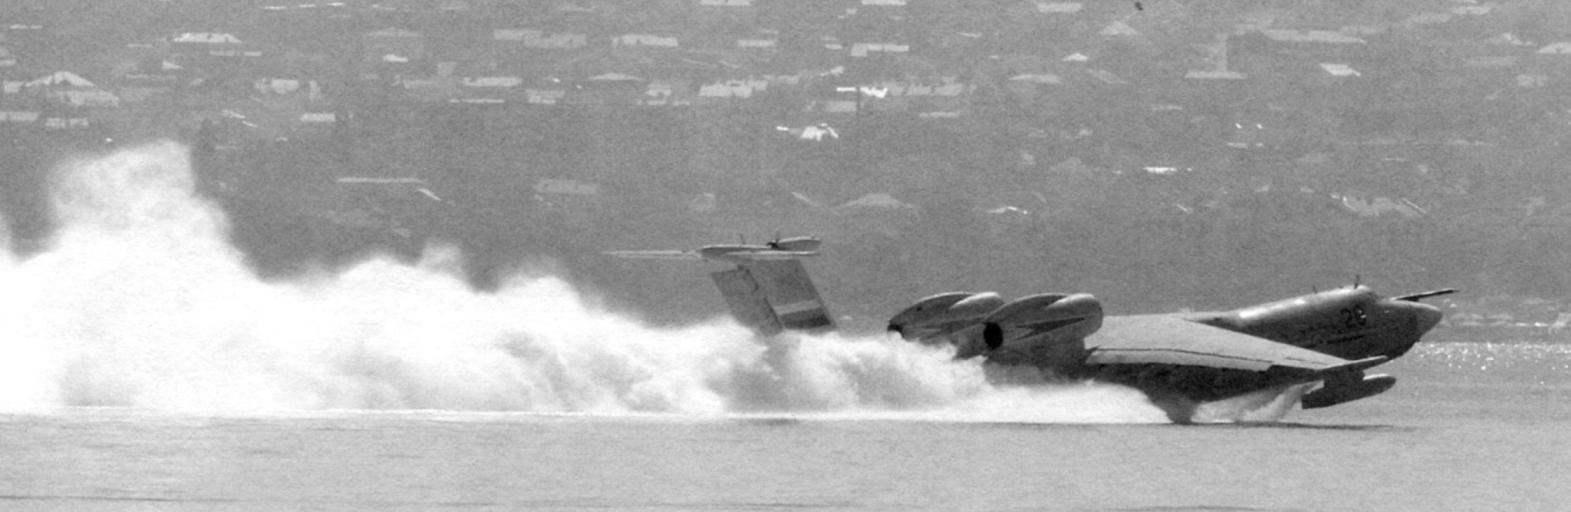 A-42пэ on the run